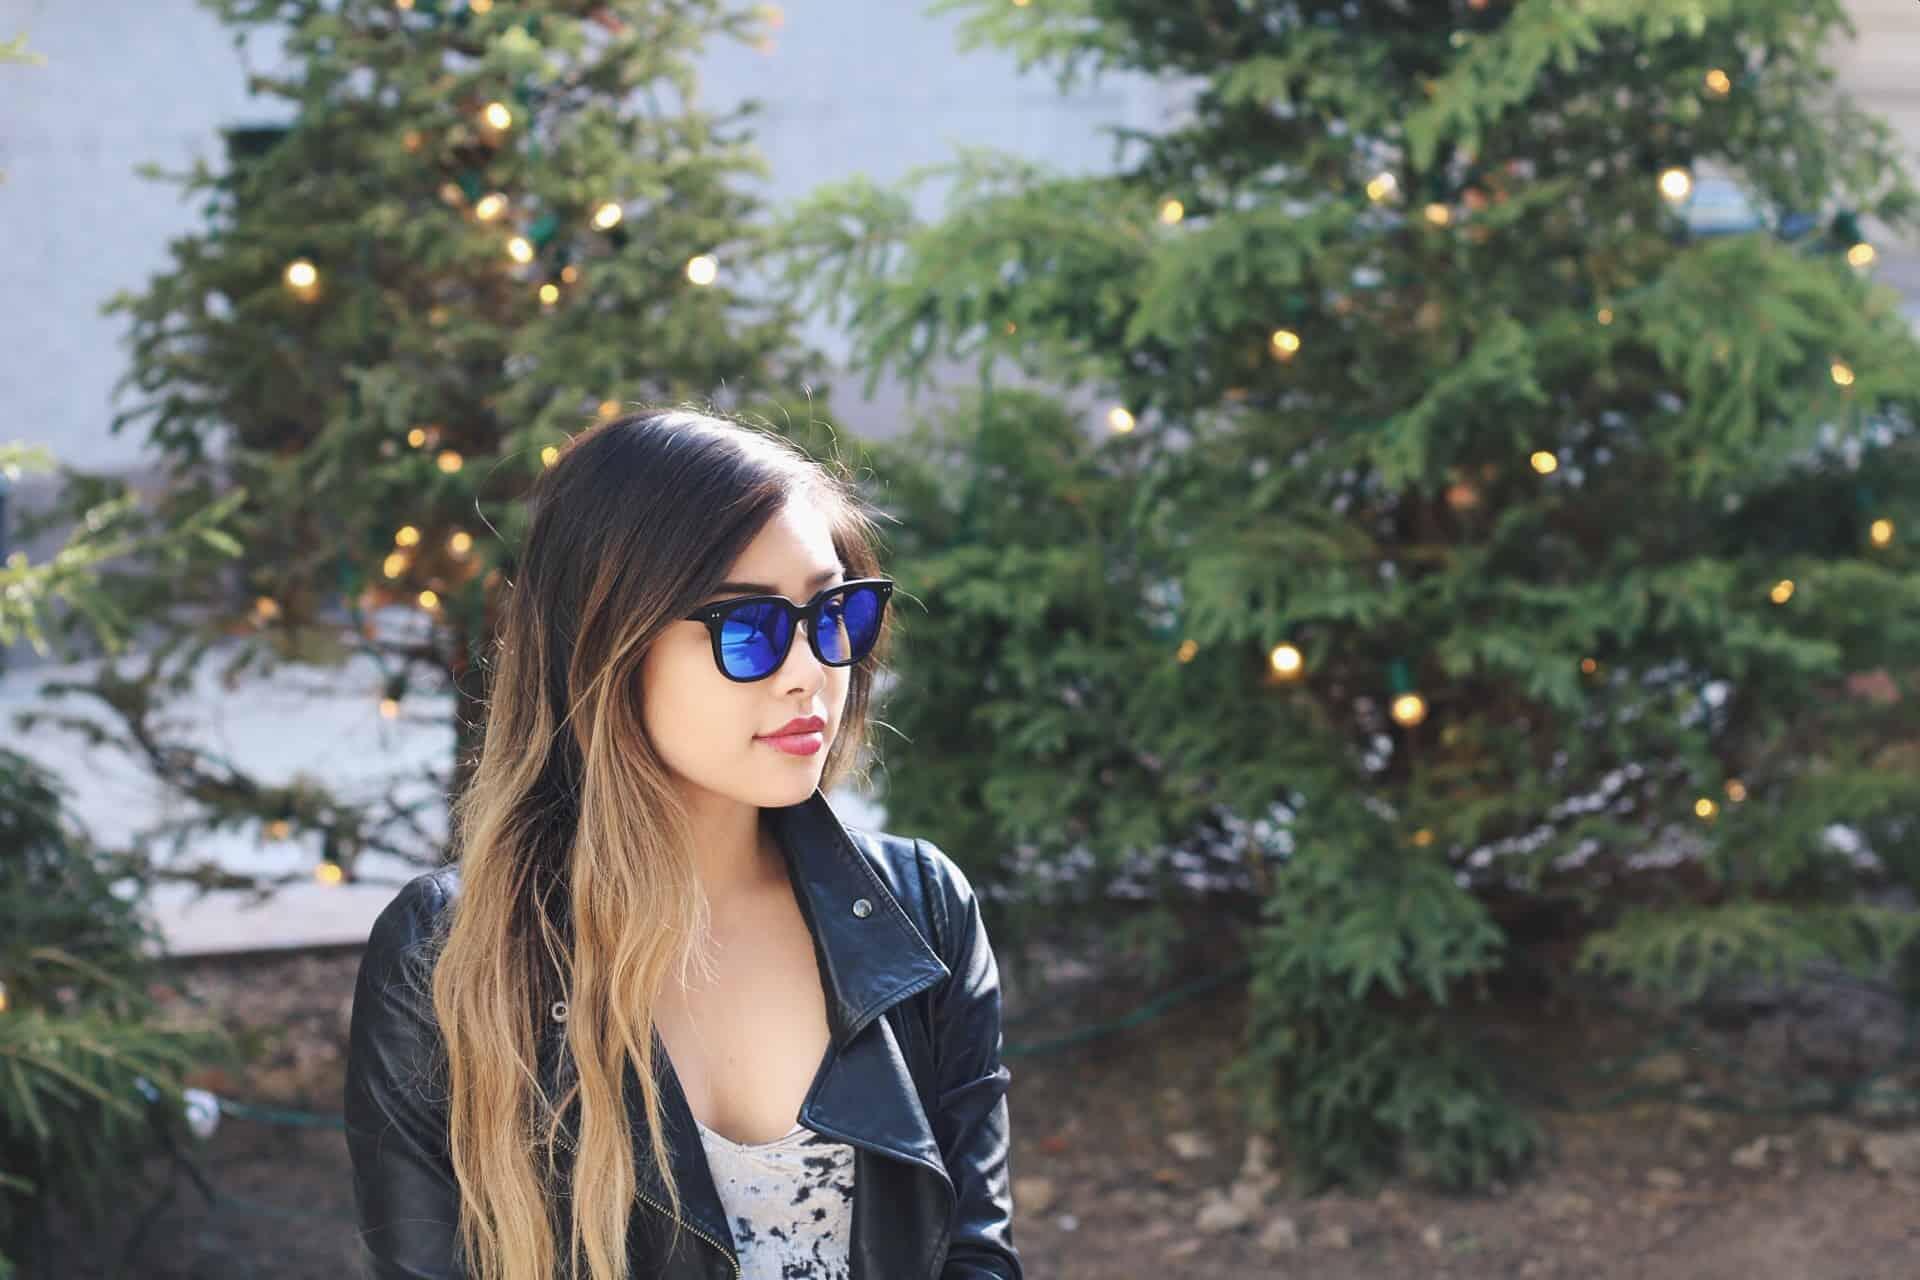 Sunglasses from Marsquest, a local Toronto-based eyewear brand